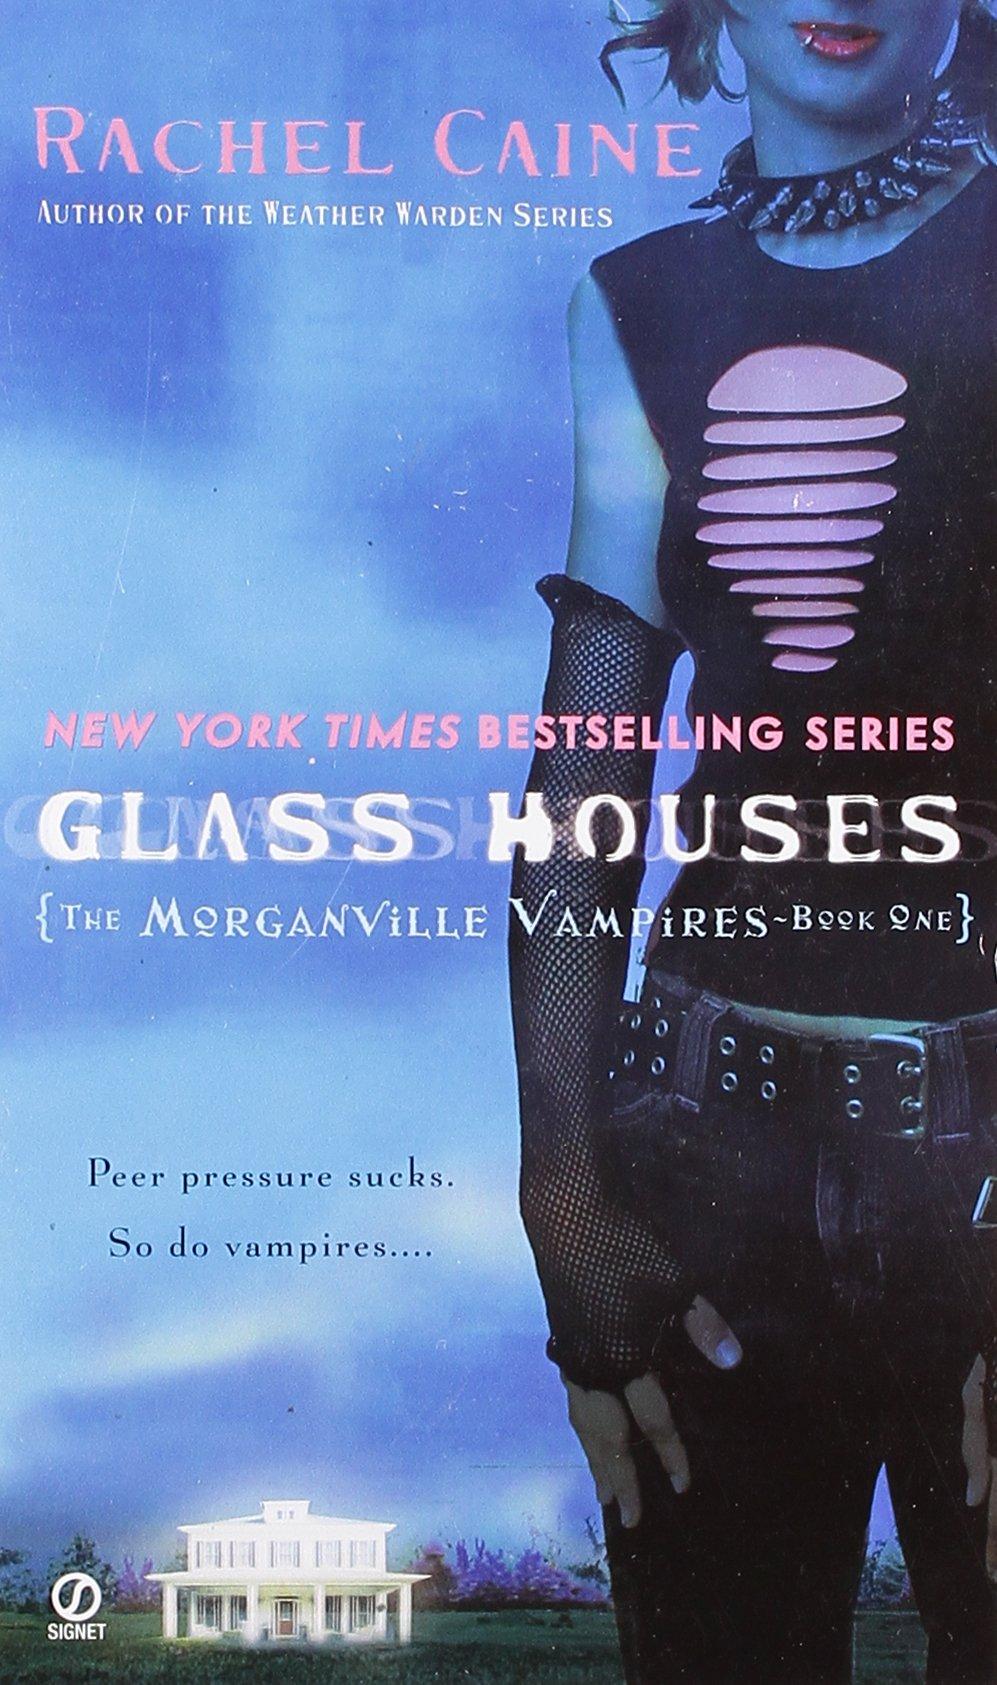 Amazon: Glass Houses (morganville Vampires, Book 1) (9780451219947):  Rachel Caine: Books